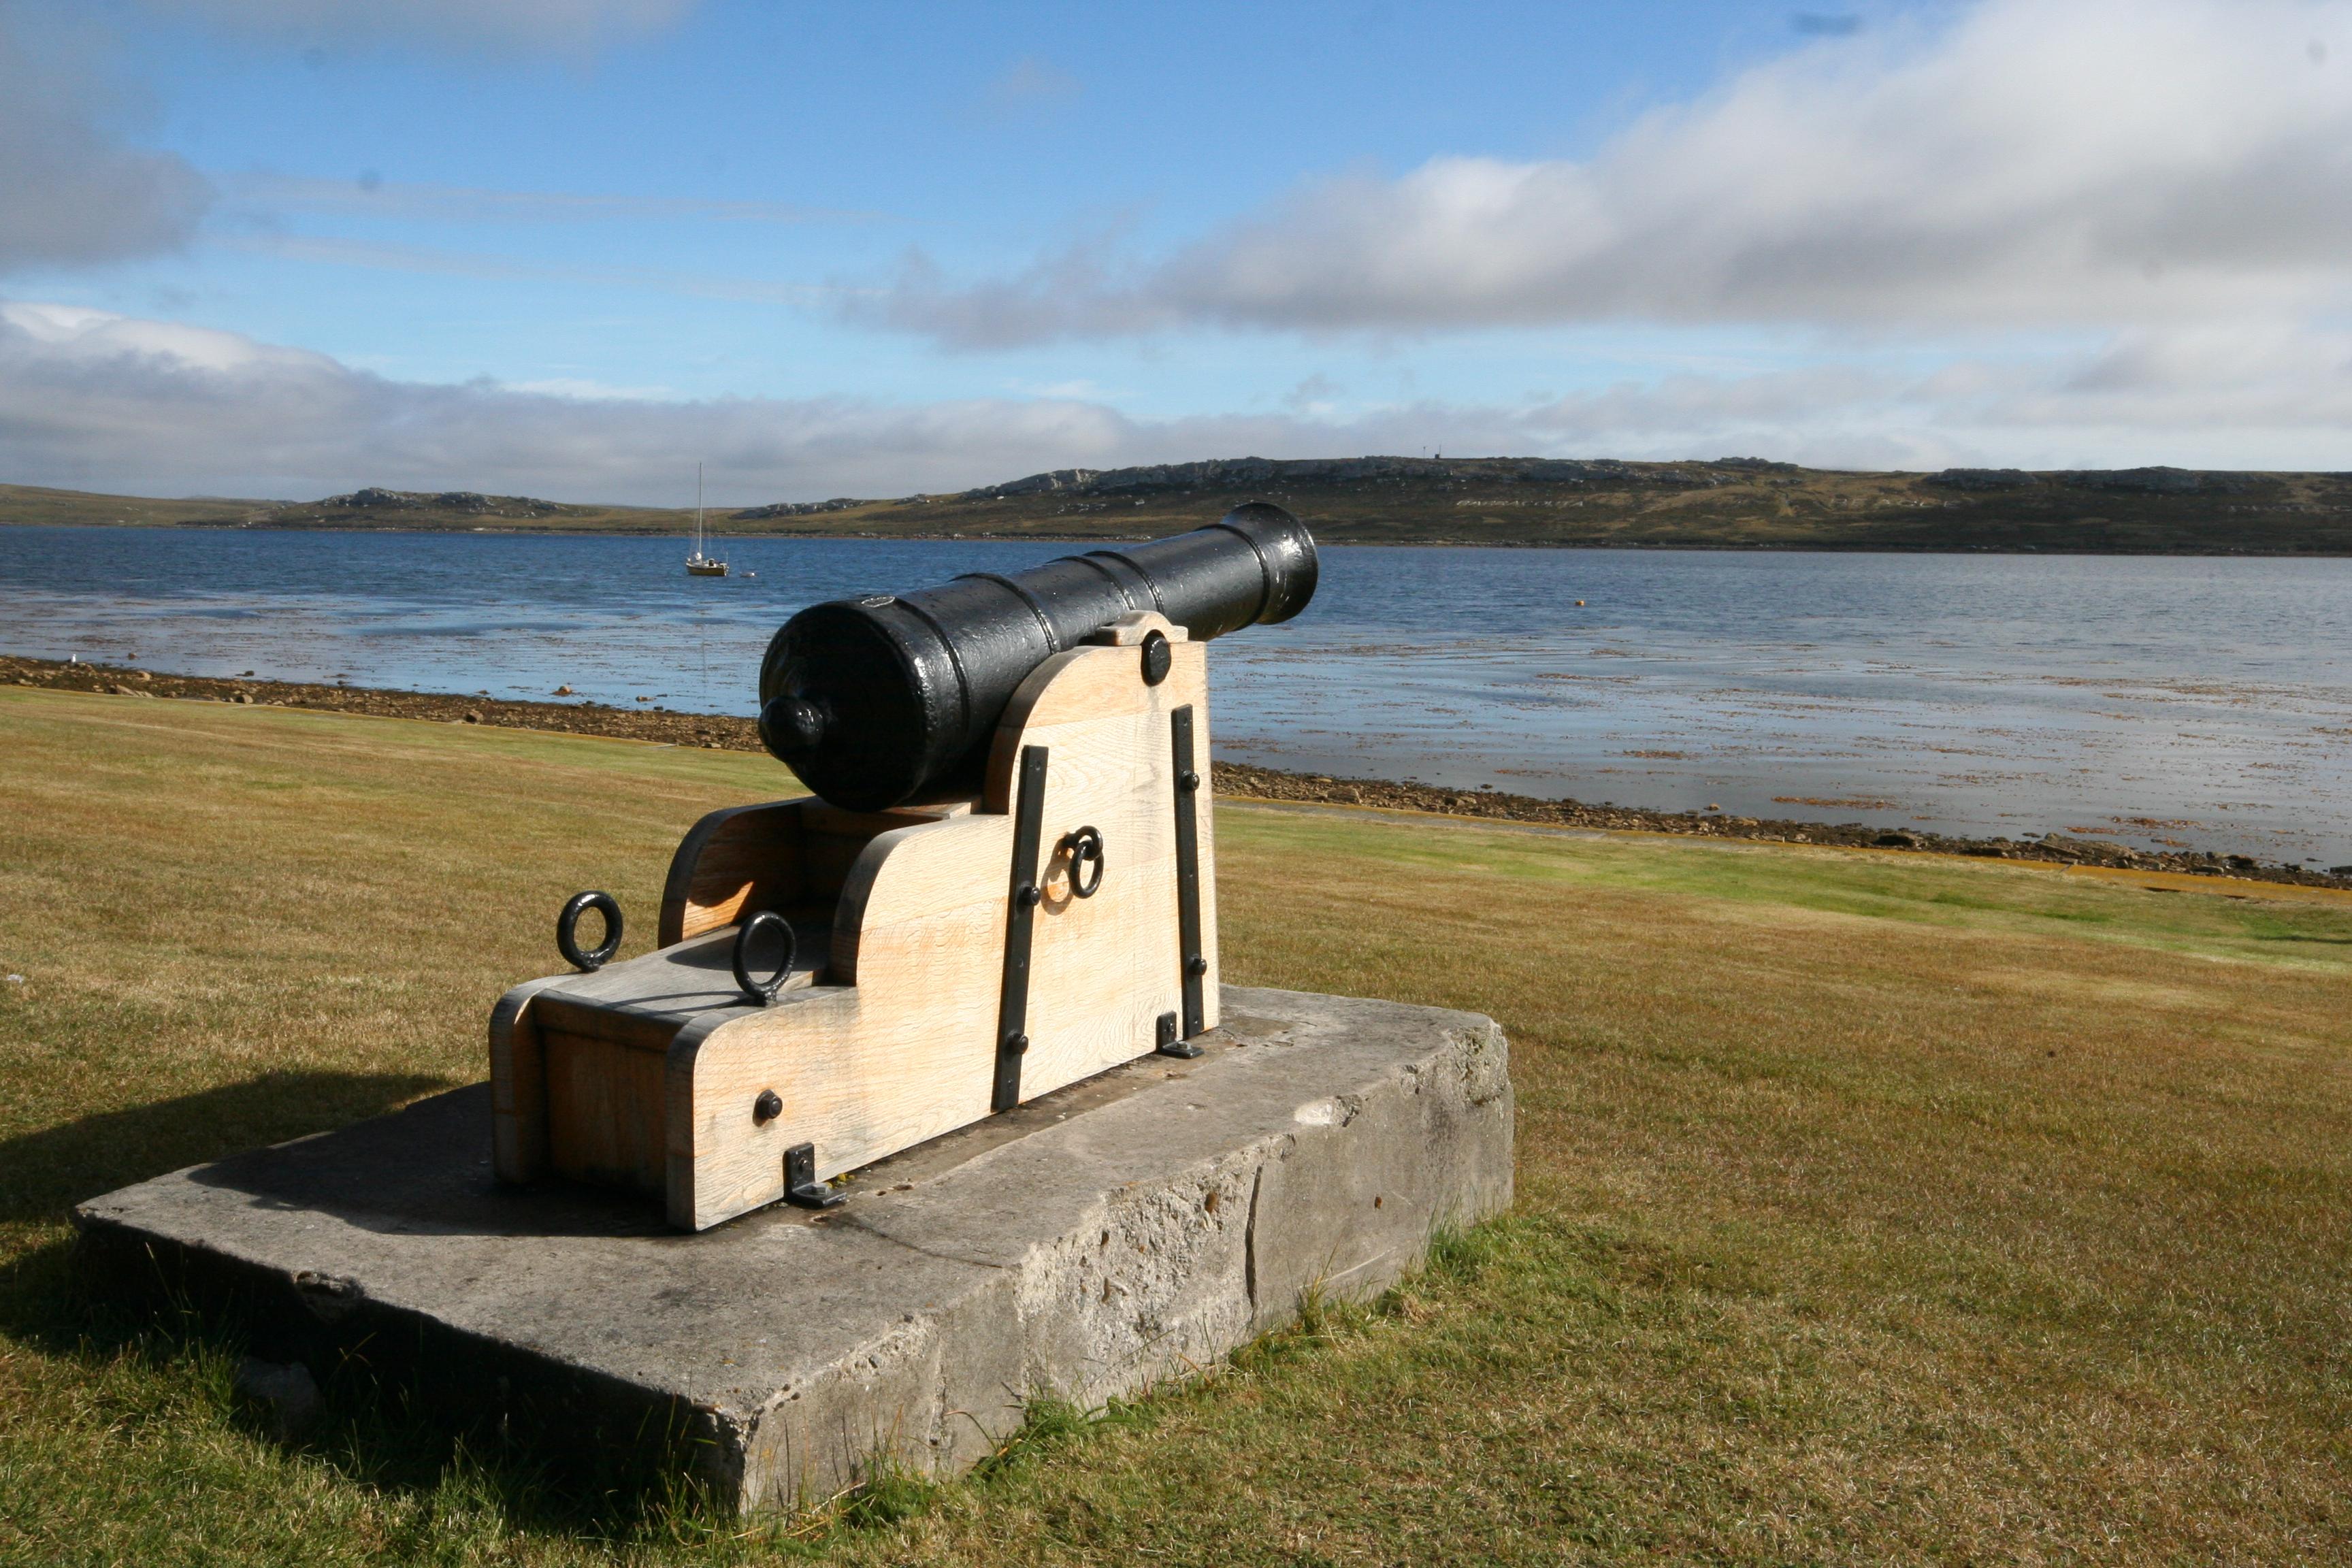 cannon_Falkland Islands